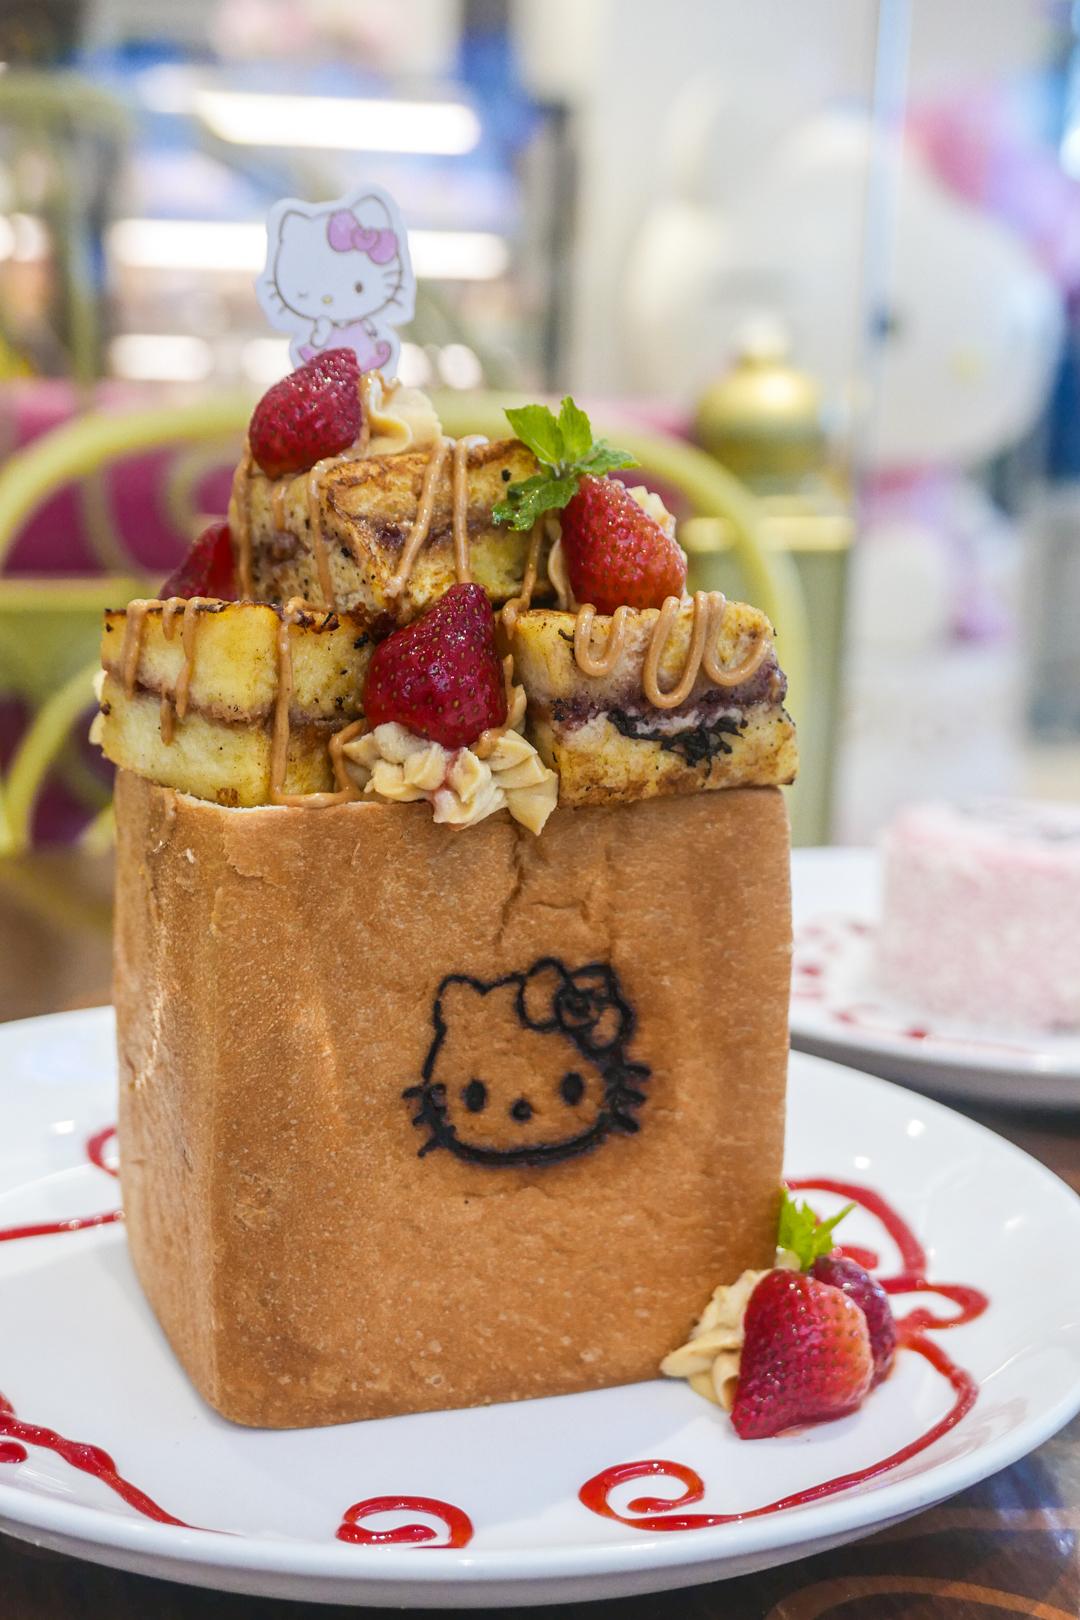 Hello Kitty Cafe BGC french toast dessert